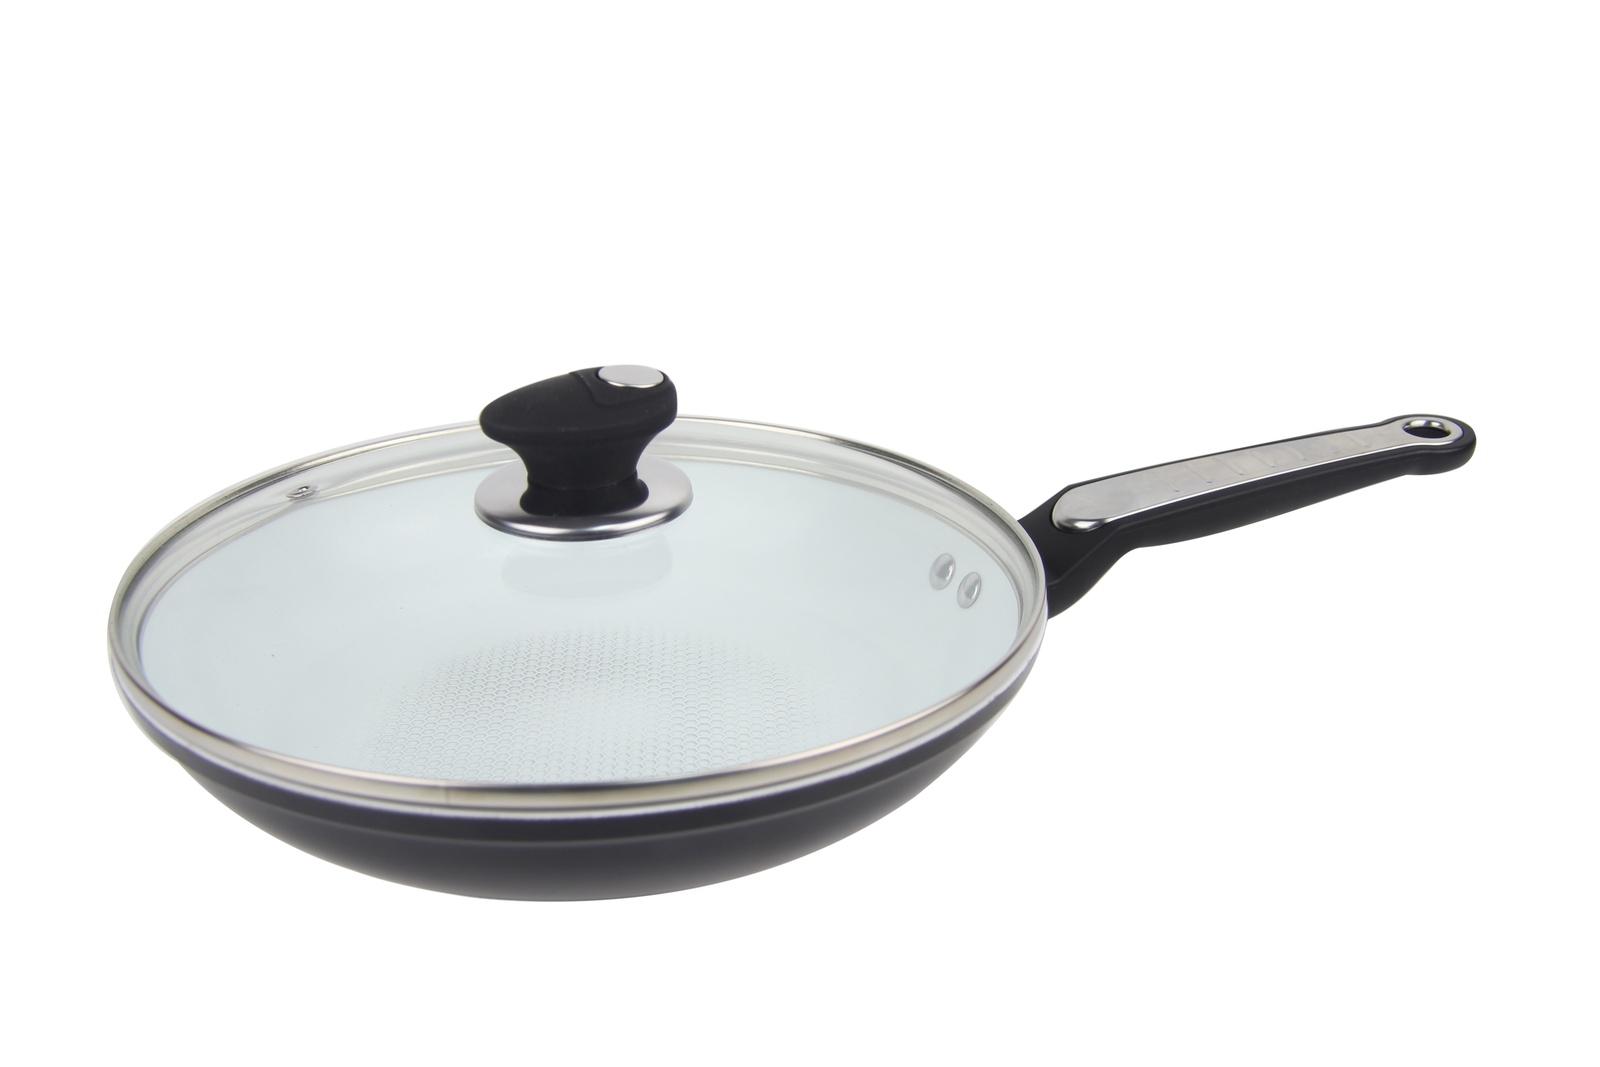 Сковорода Bohmann BH-7822, диаметр 22 см, черный сковорода bohmann 28cm bh 1010 28mrb